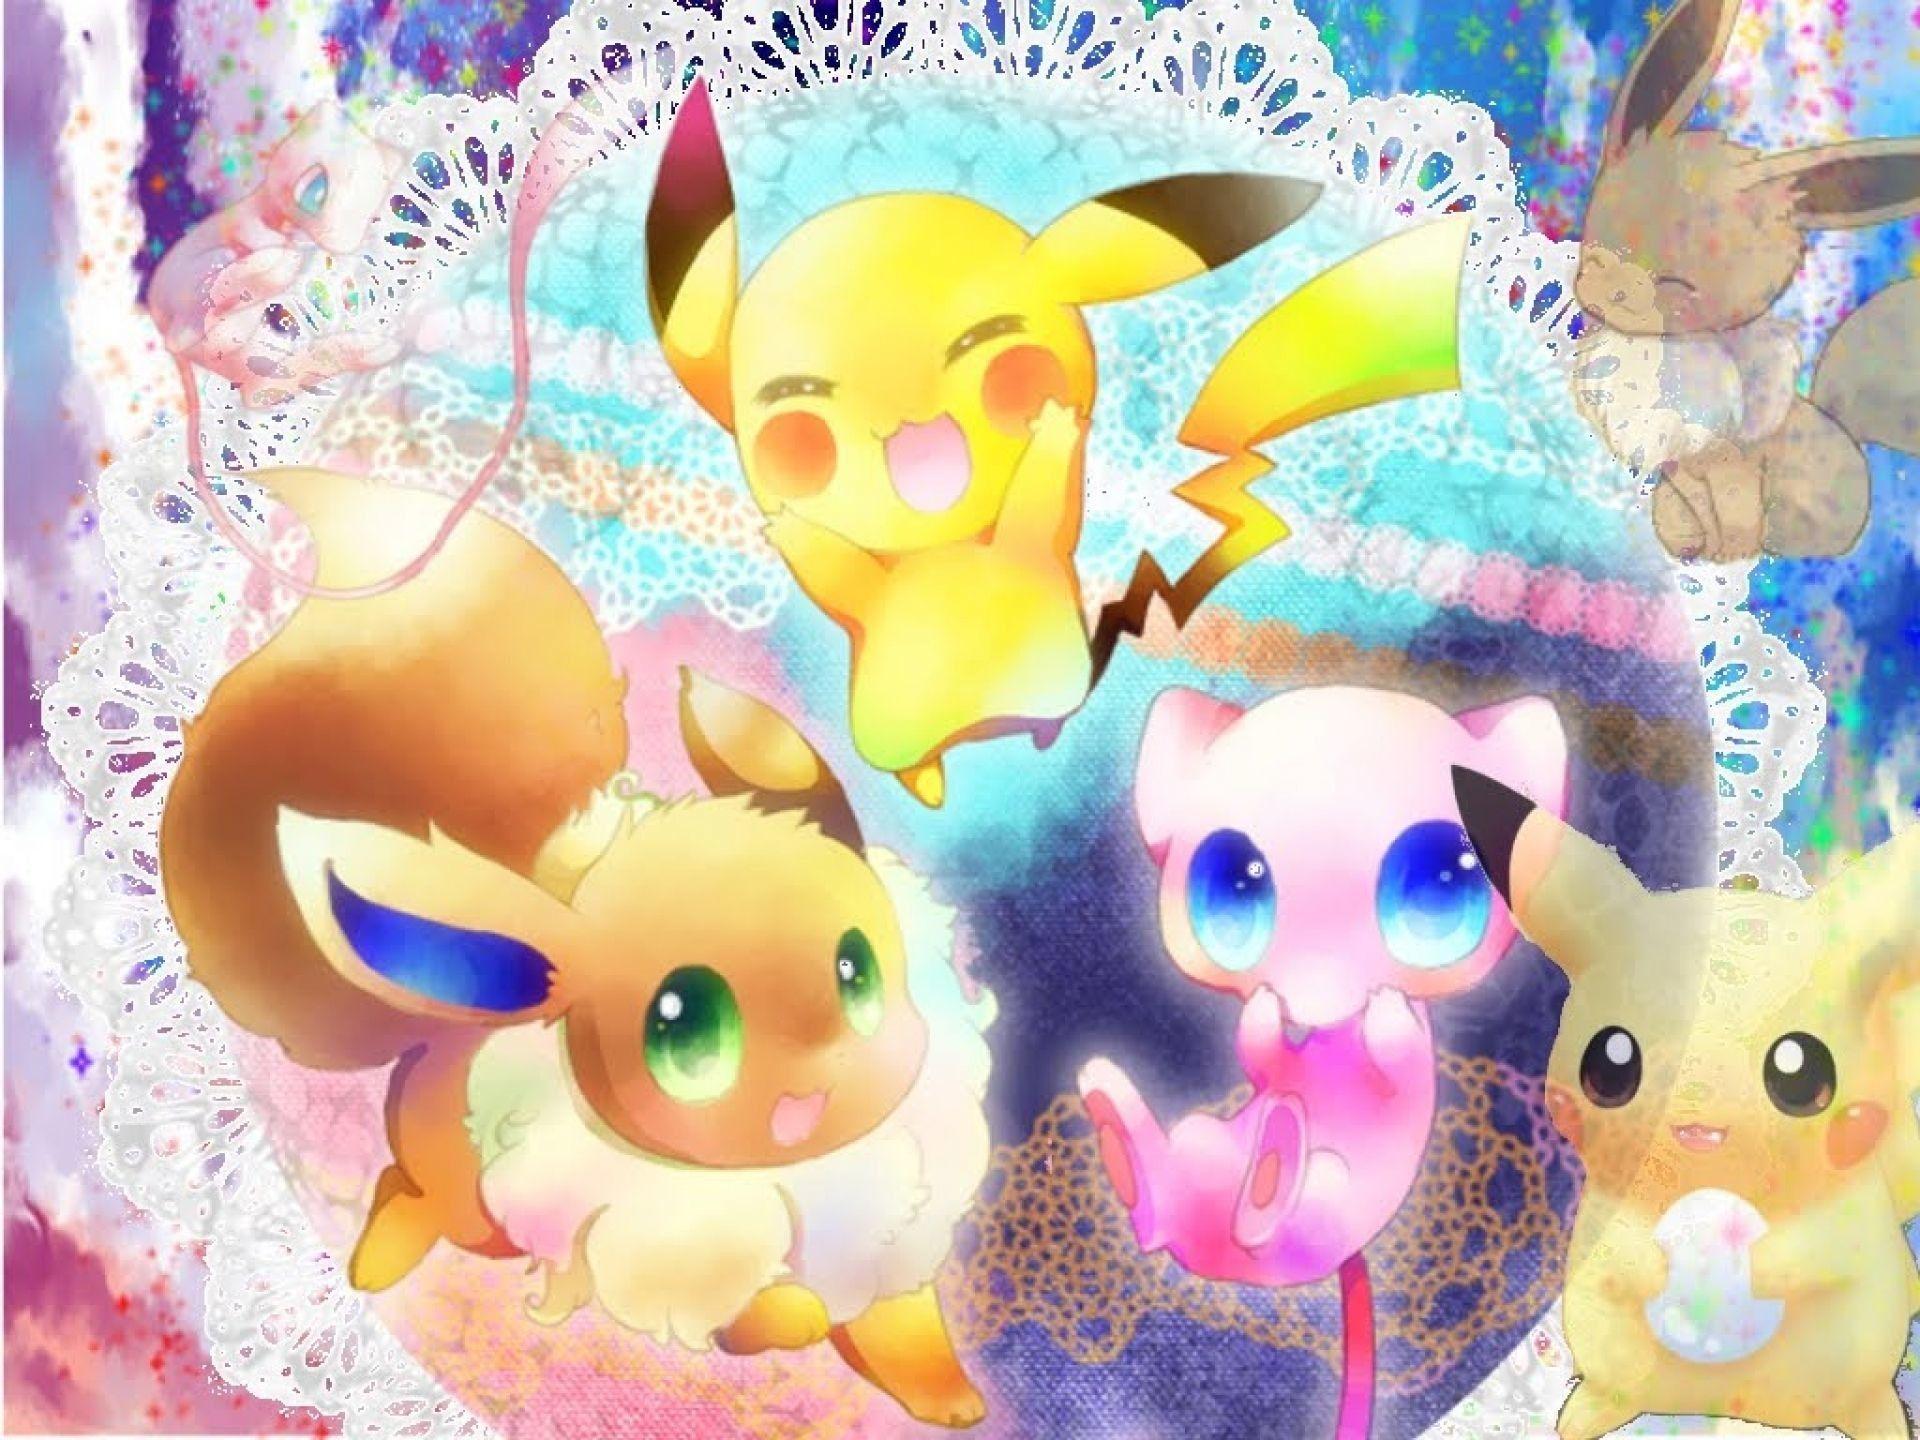 Pokemon Wallpaper Hd Download Free 81 Cute Pokemon Wallpapers On Wallpaperplay Pokemon Charizard Wa Cute Pokemon Wallpaper Cute Pokemon Hd Pokemon Wallpapers